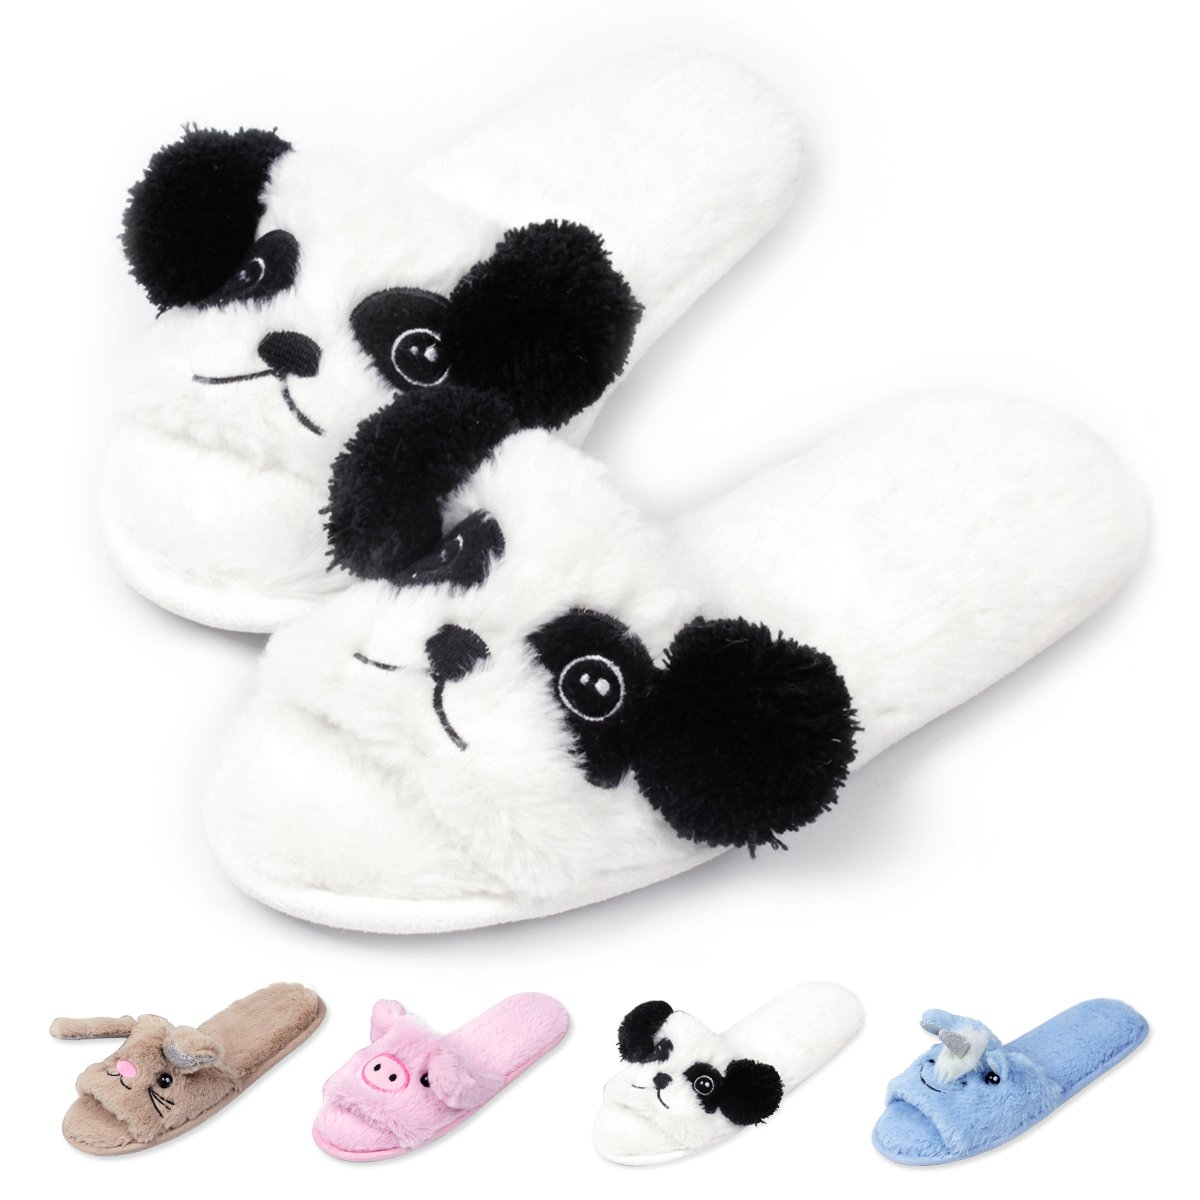 Womens Open Toe Slippers | Cute Bunny Unicorn Animal Slipper | Soft Fleece Memory Foam Clog | Anti-Slip Sole Indoor Outdoor Shoes | Flip Flop Spa Slippers (7-8, WhitePanda) by Caramella Bubble